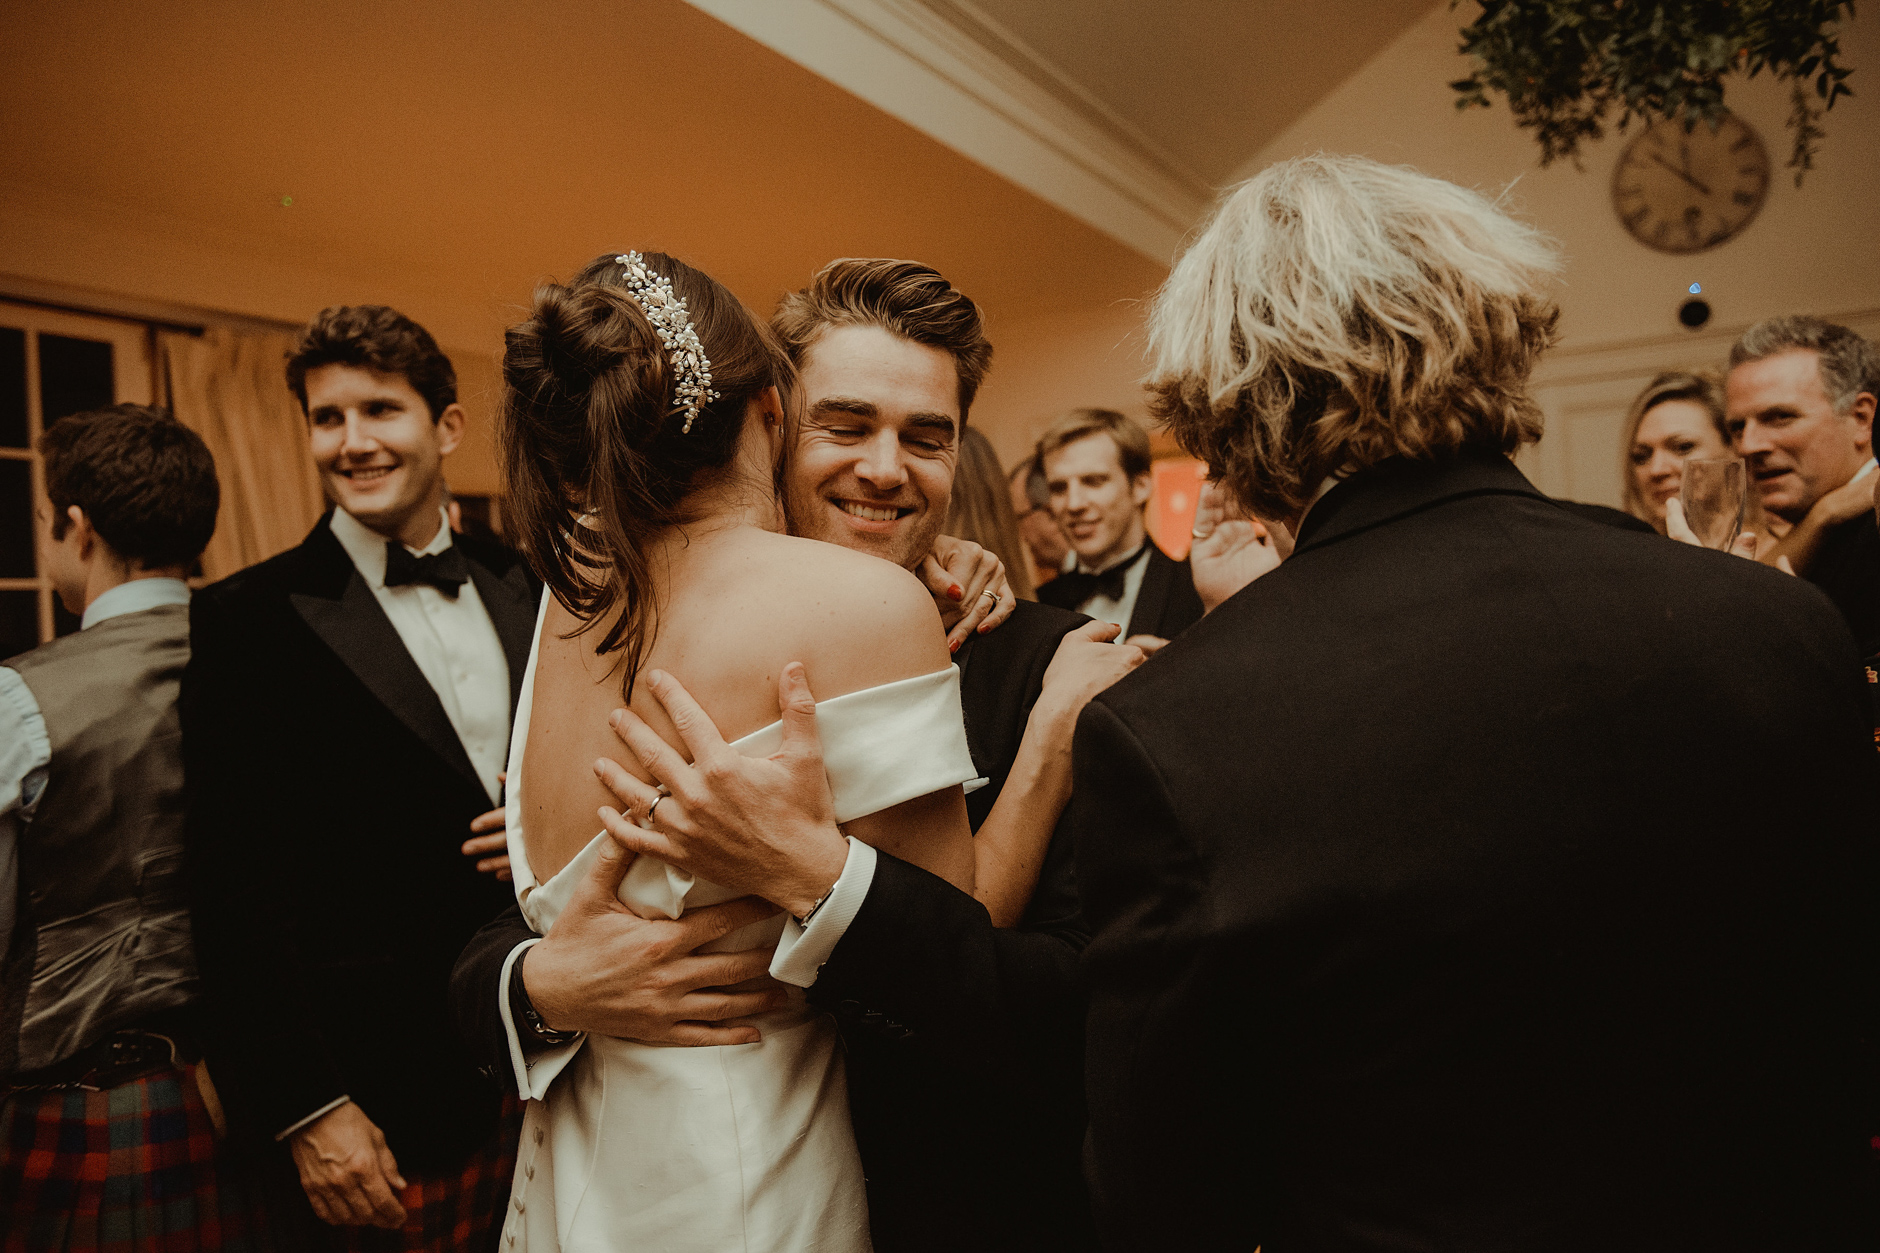 Glentruim-Wedding-Nikki-Leadbetter-Photography-374.jpg